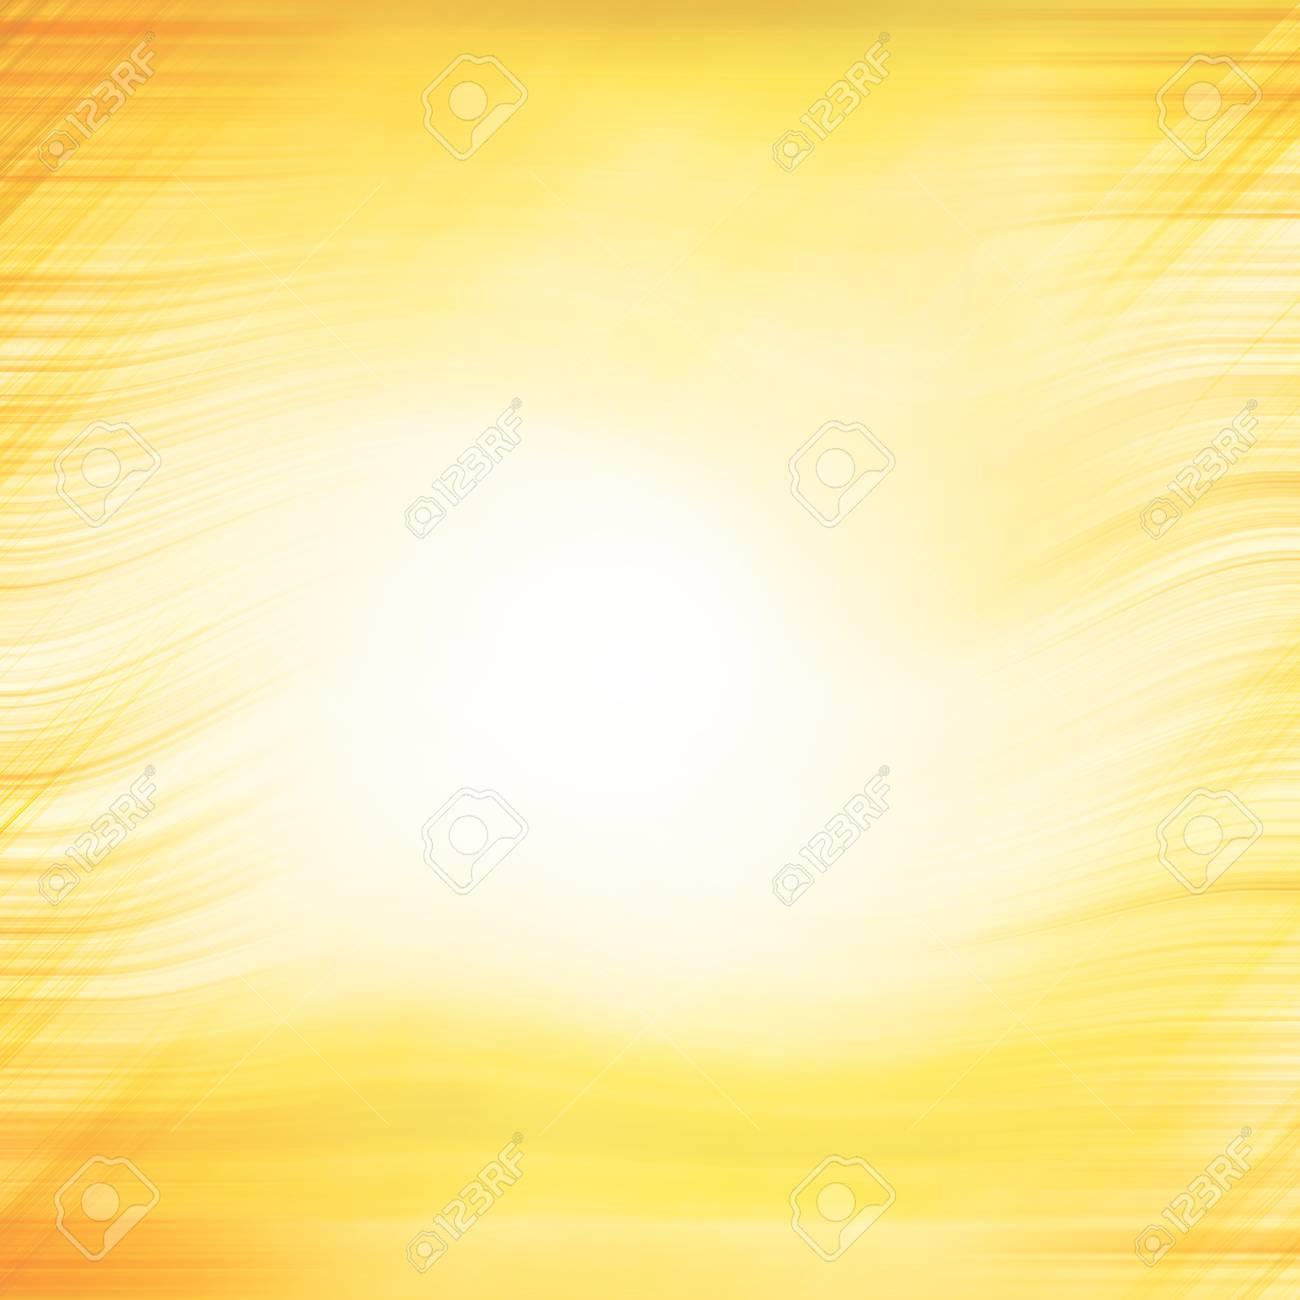 Abstract Background Centered Yellow Orange Summer Sun Light